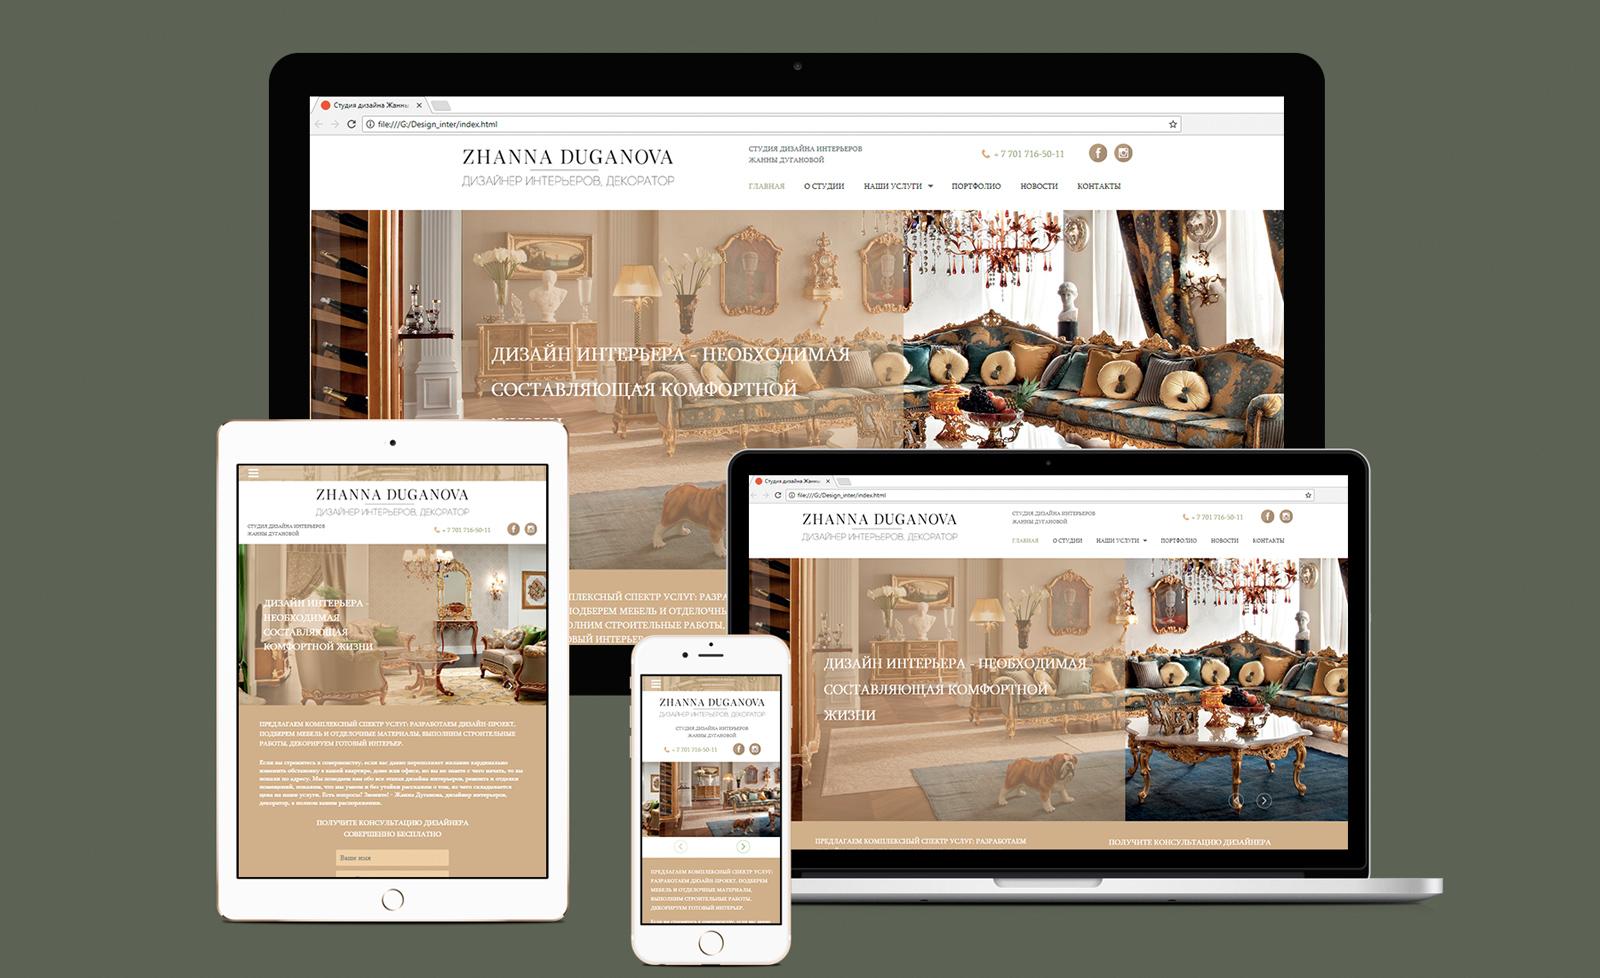 Создание psd макета для сайта создание сайтов в челябинске цена